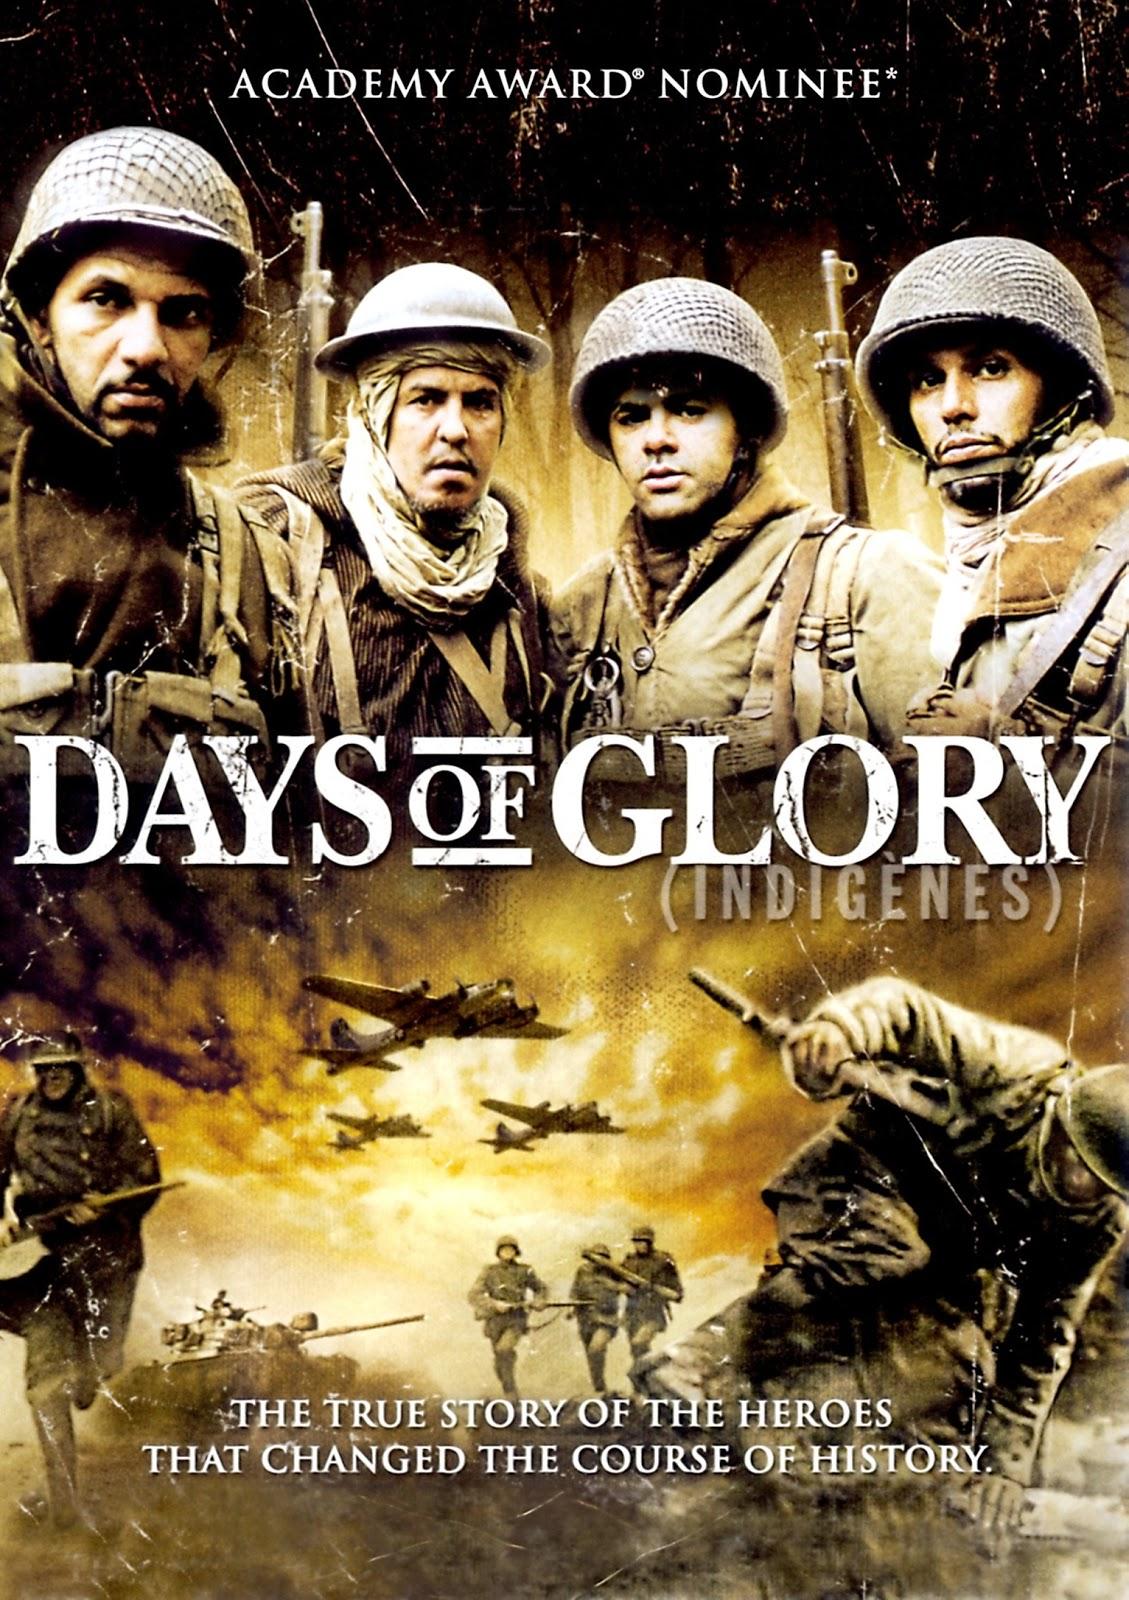 LVII Series & Movies DB - Página 4 Days_of_glory_2006_ws_r1-front-www.getdvdcovers.com_